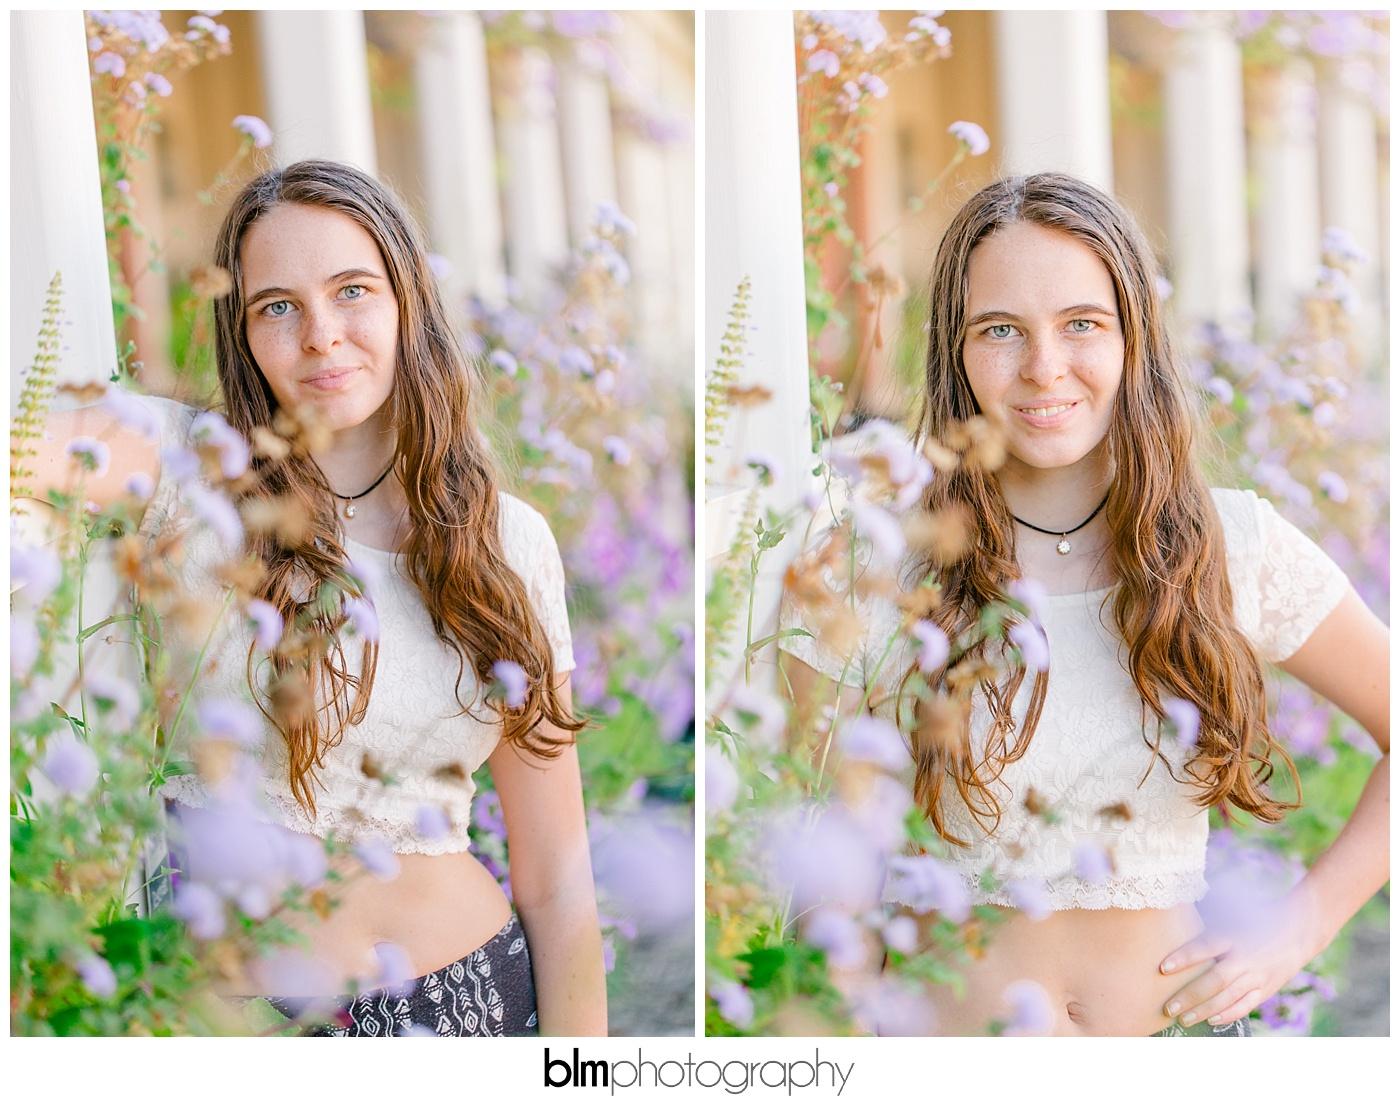 Carly-Cresta_Senior-Portraits_091516-2910.jpg